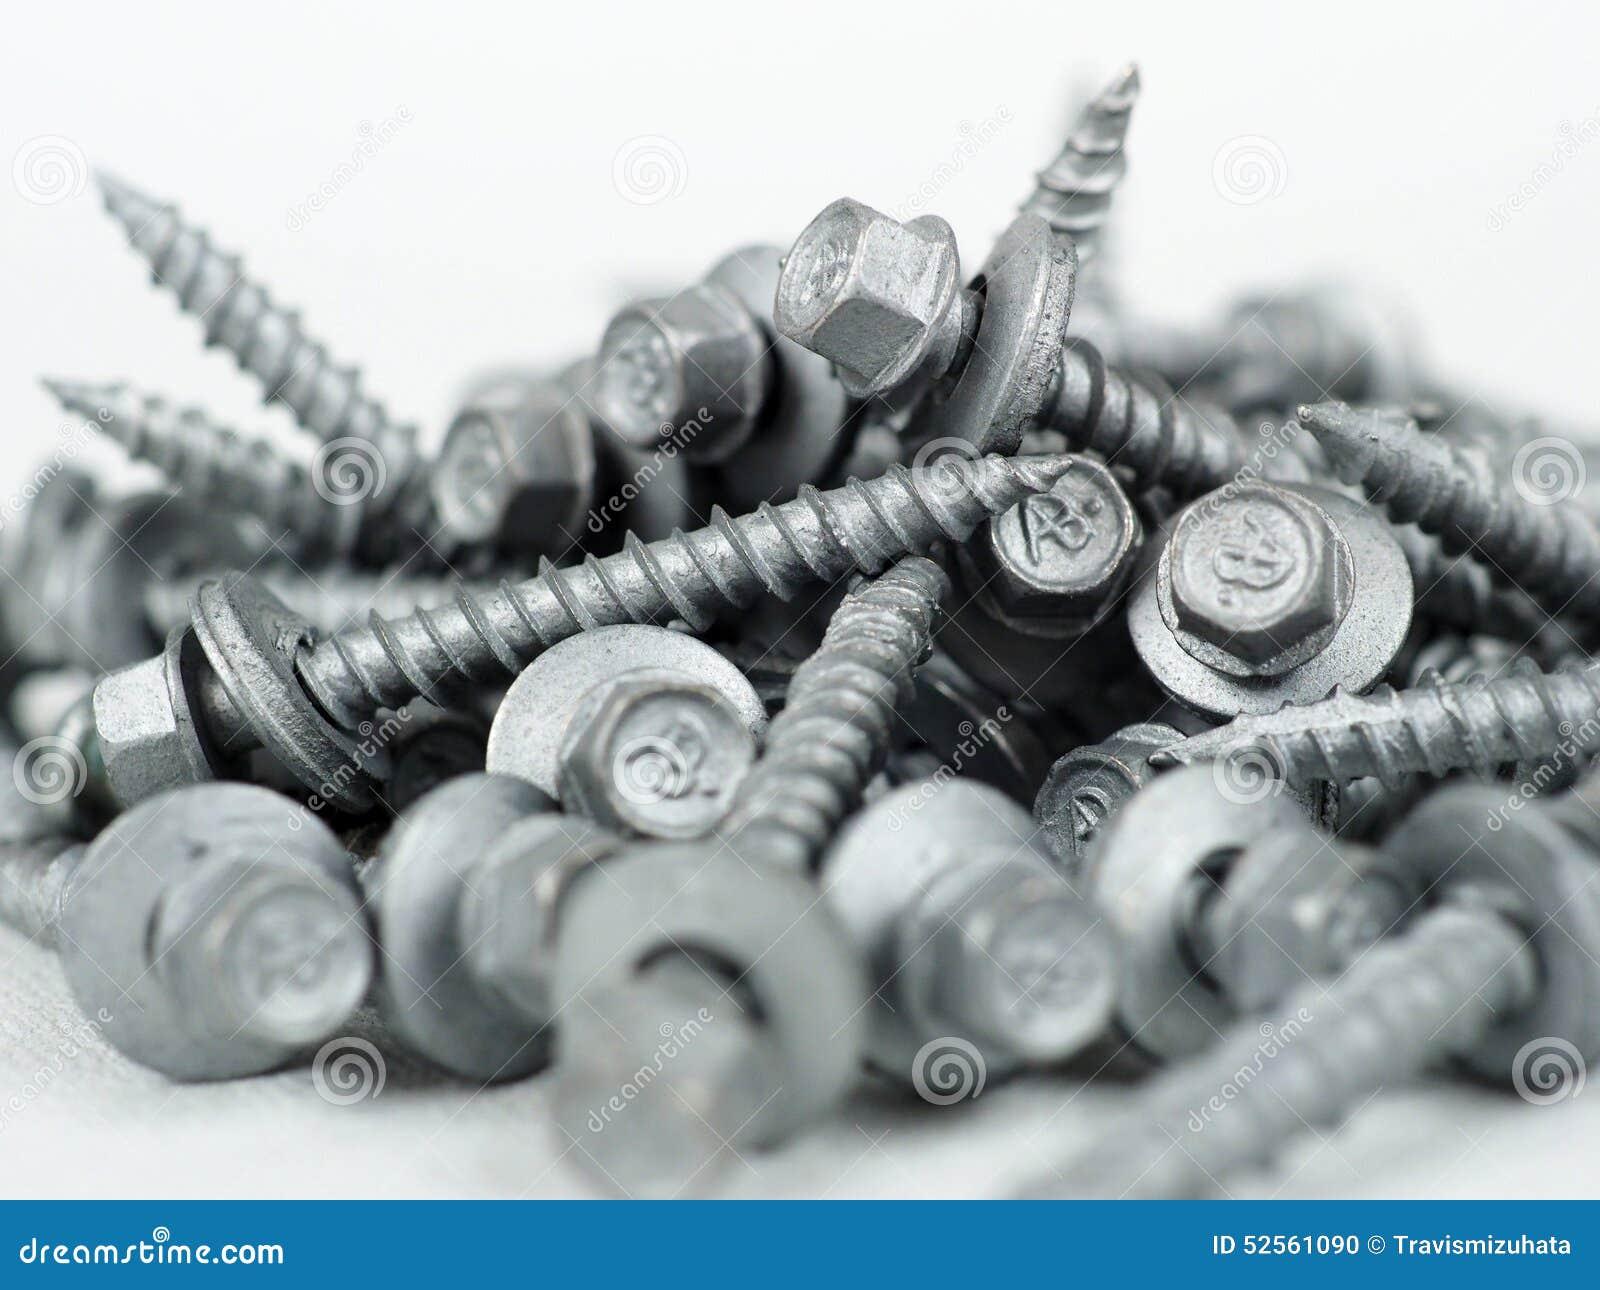 Tin Screws Stock Photo Image Of Metal Roof Drive